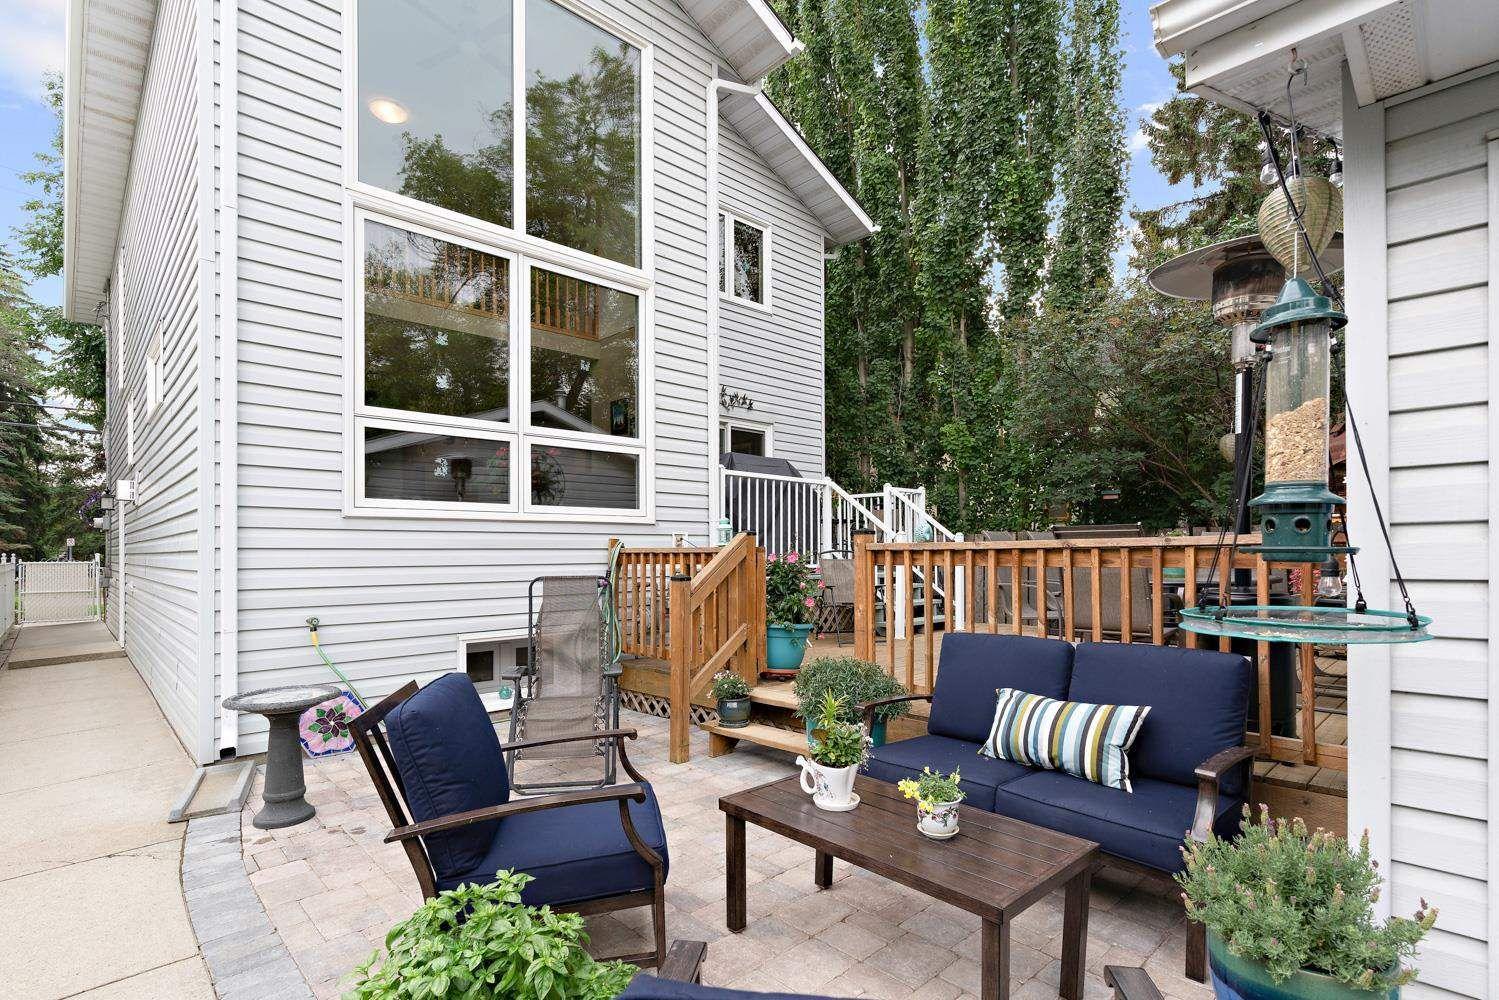 Main Photo: 9010 101A Avenue in Edmonton: Zone 13 House for sale : MLS®# E4265656